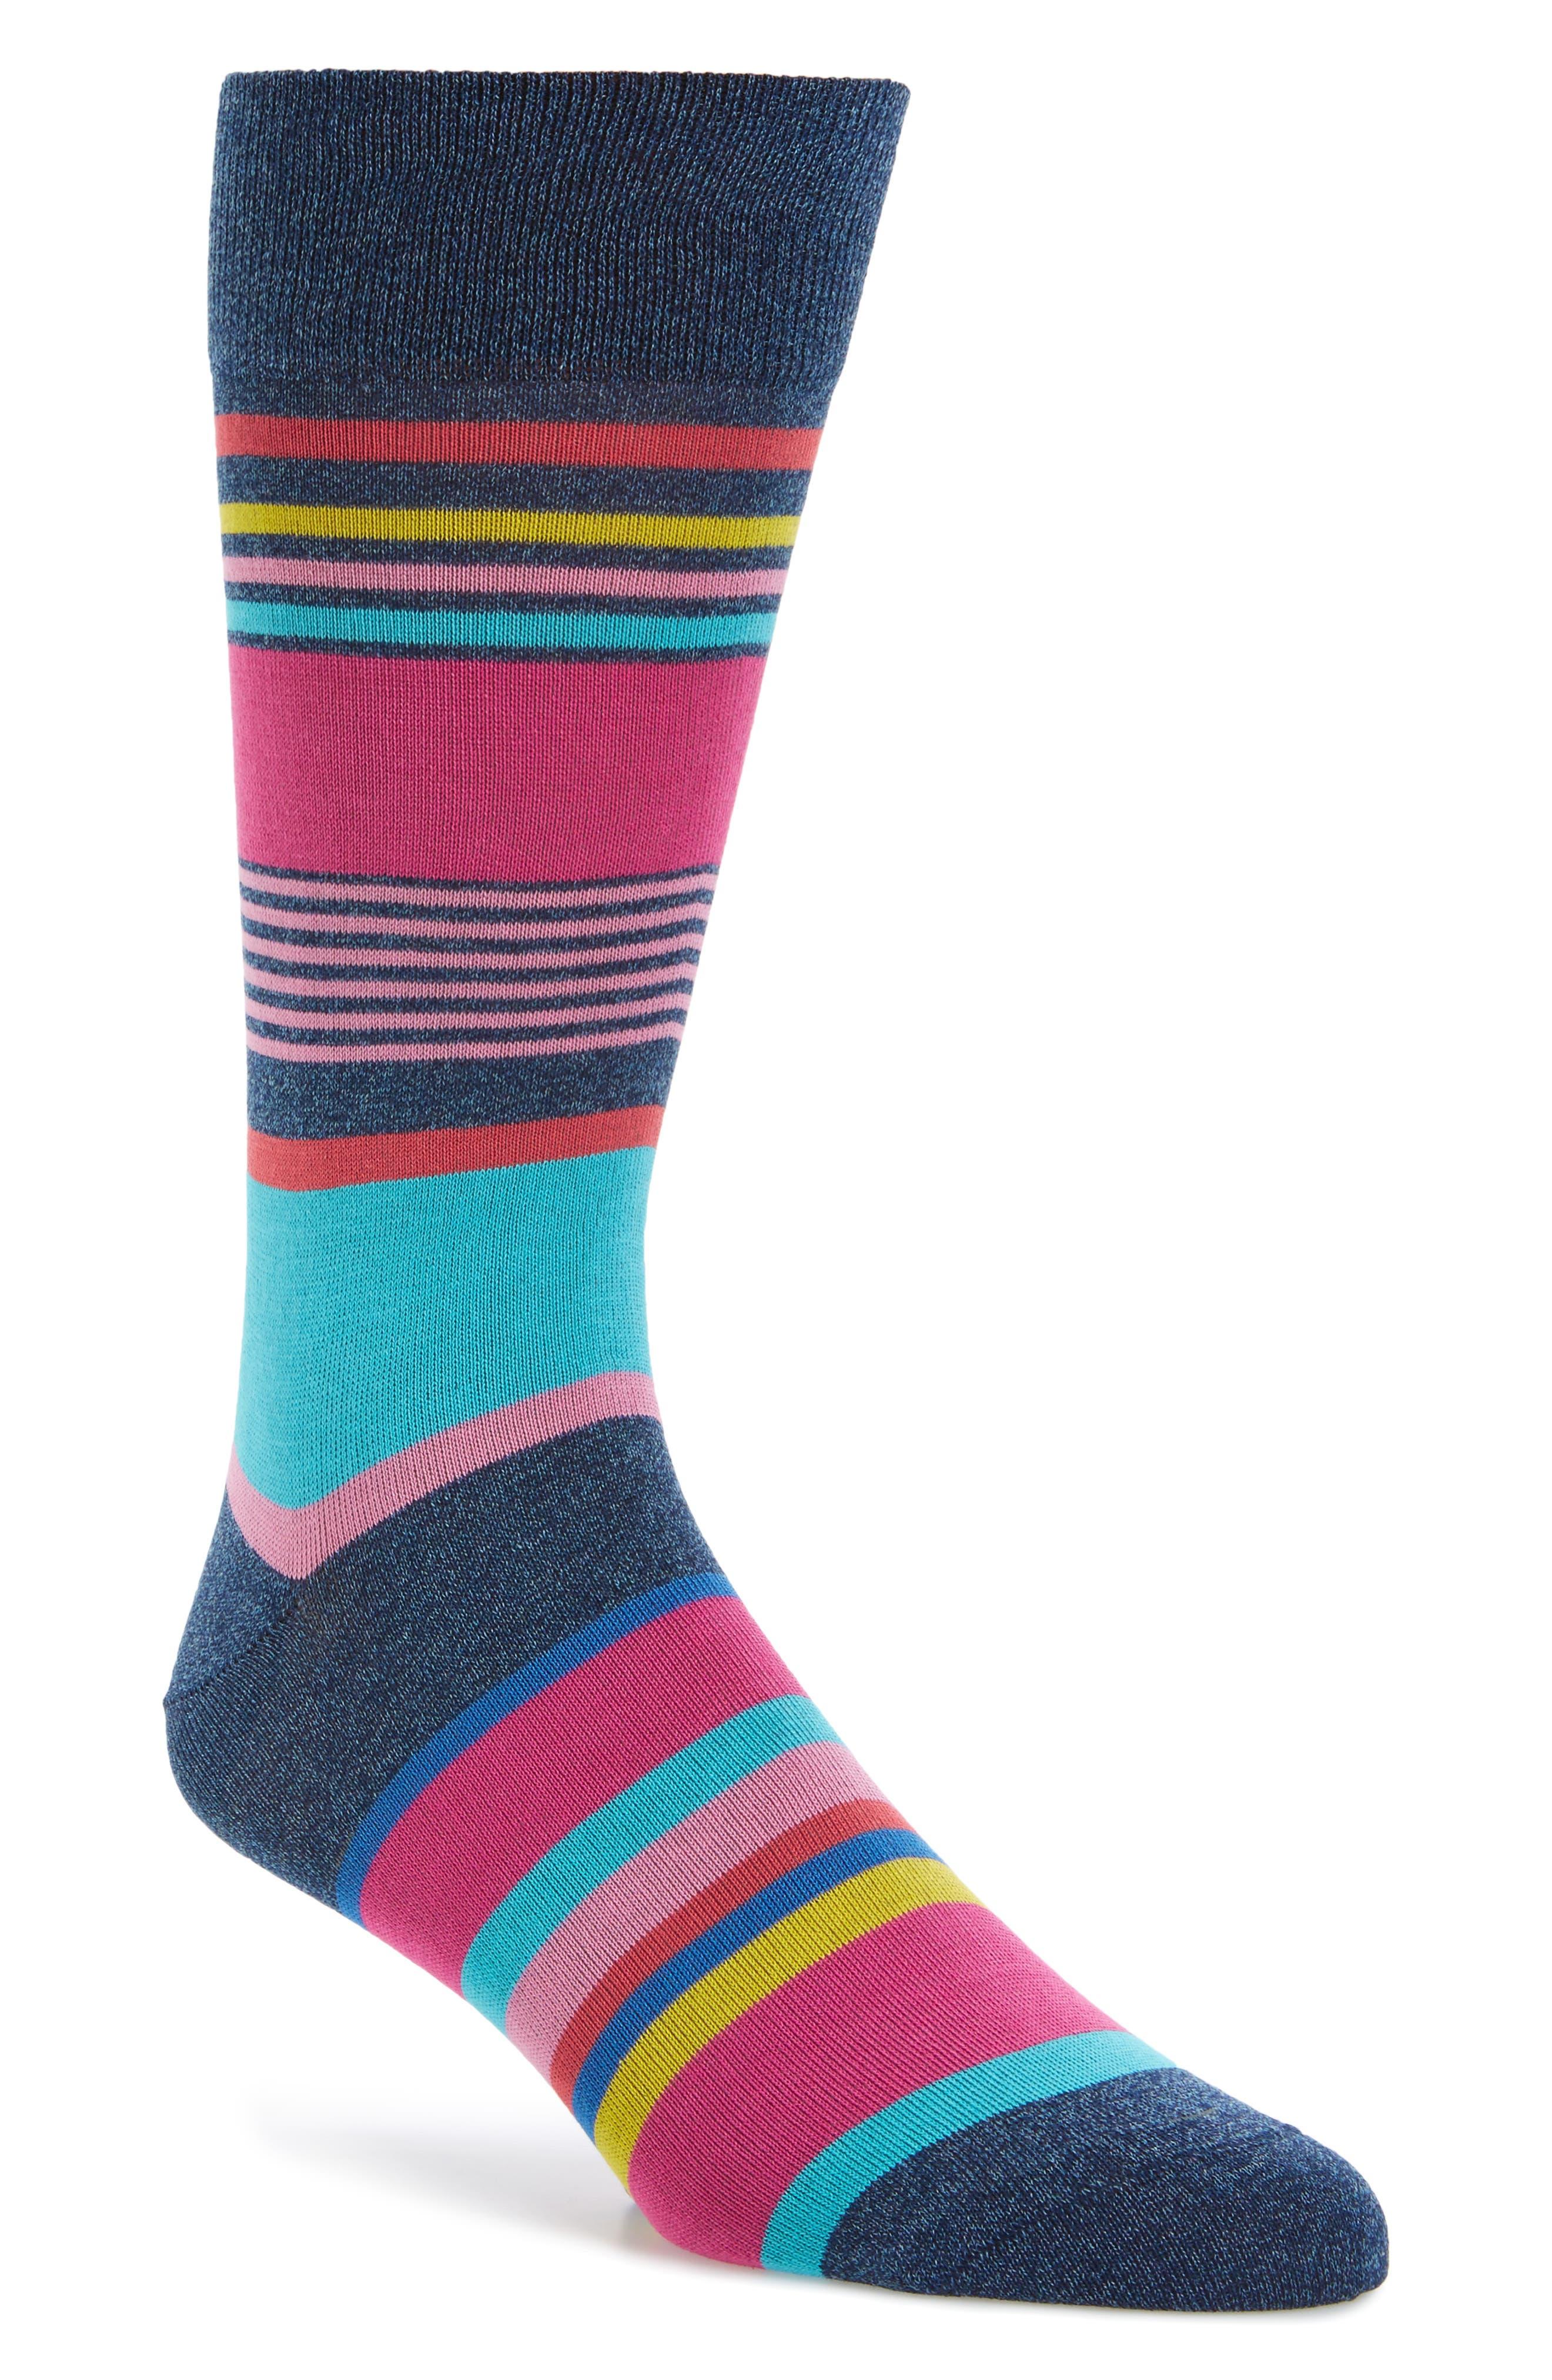 Stripe Socks,                             Main thumbnail 1, color,                             Denim/ Pink